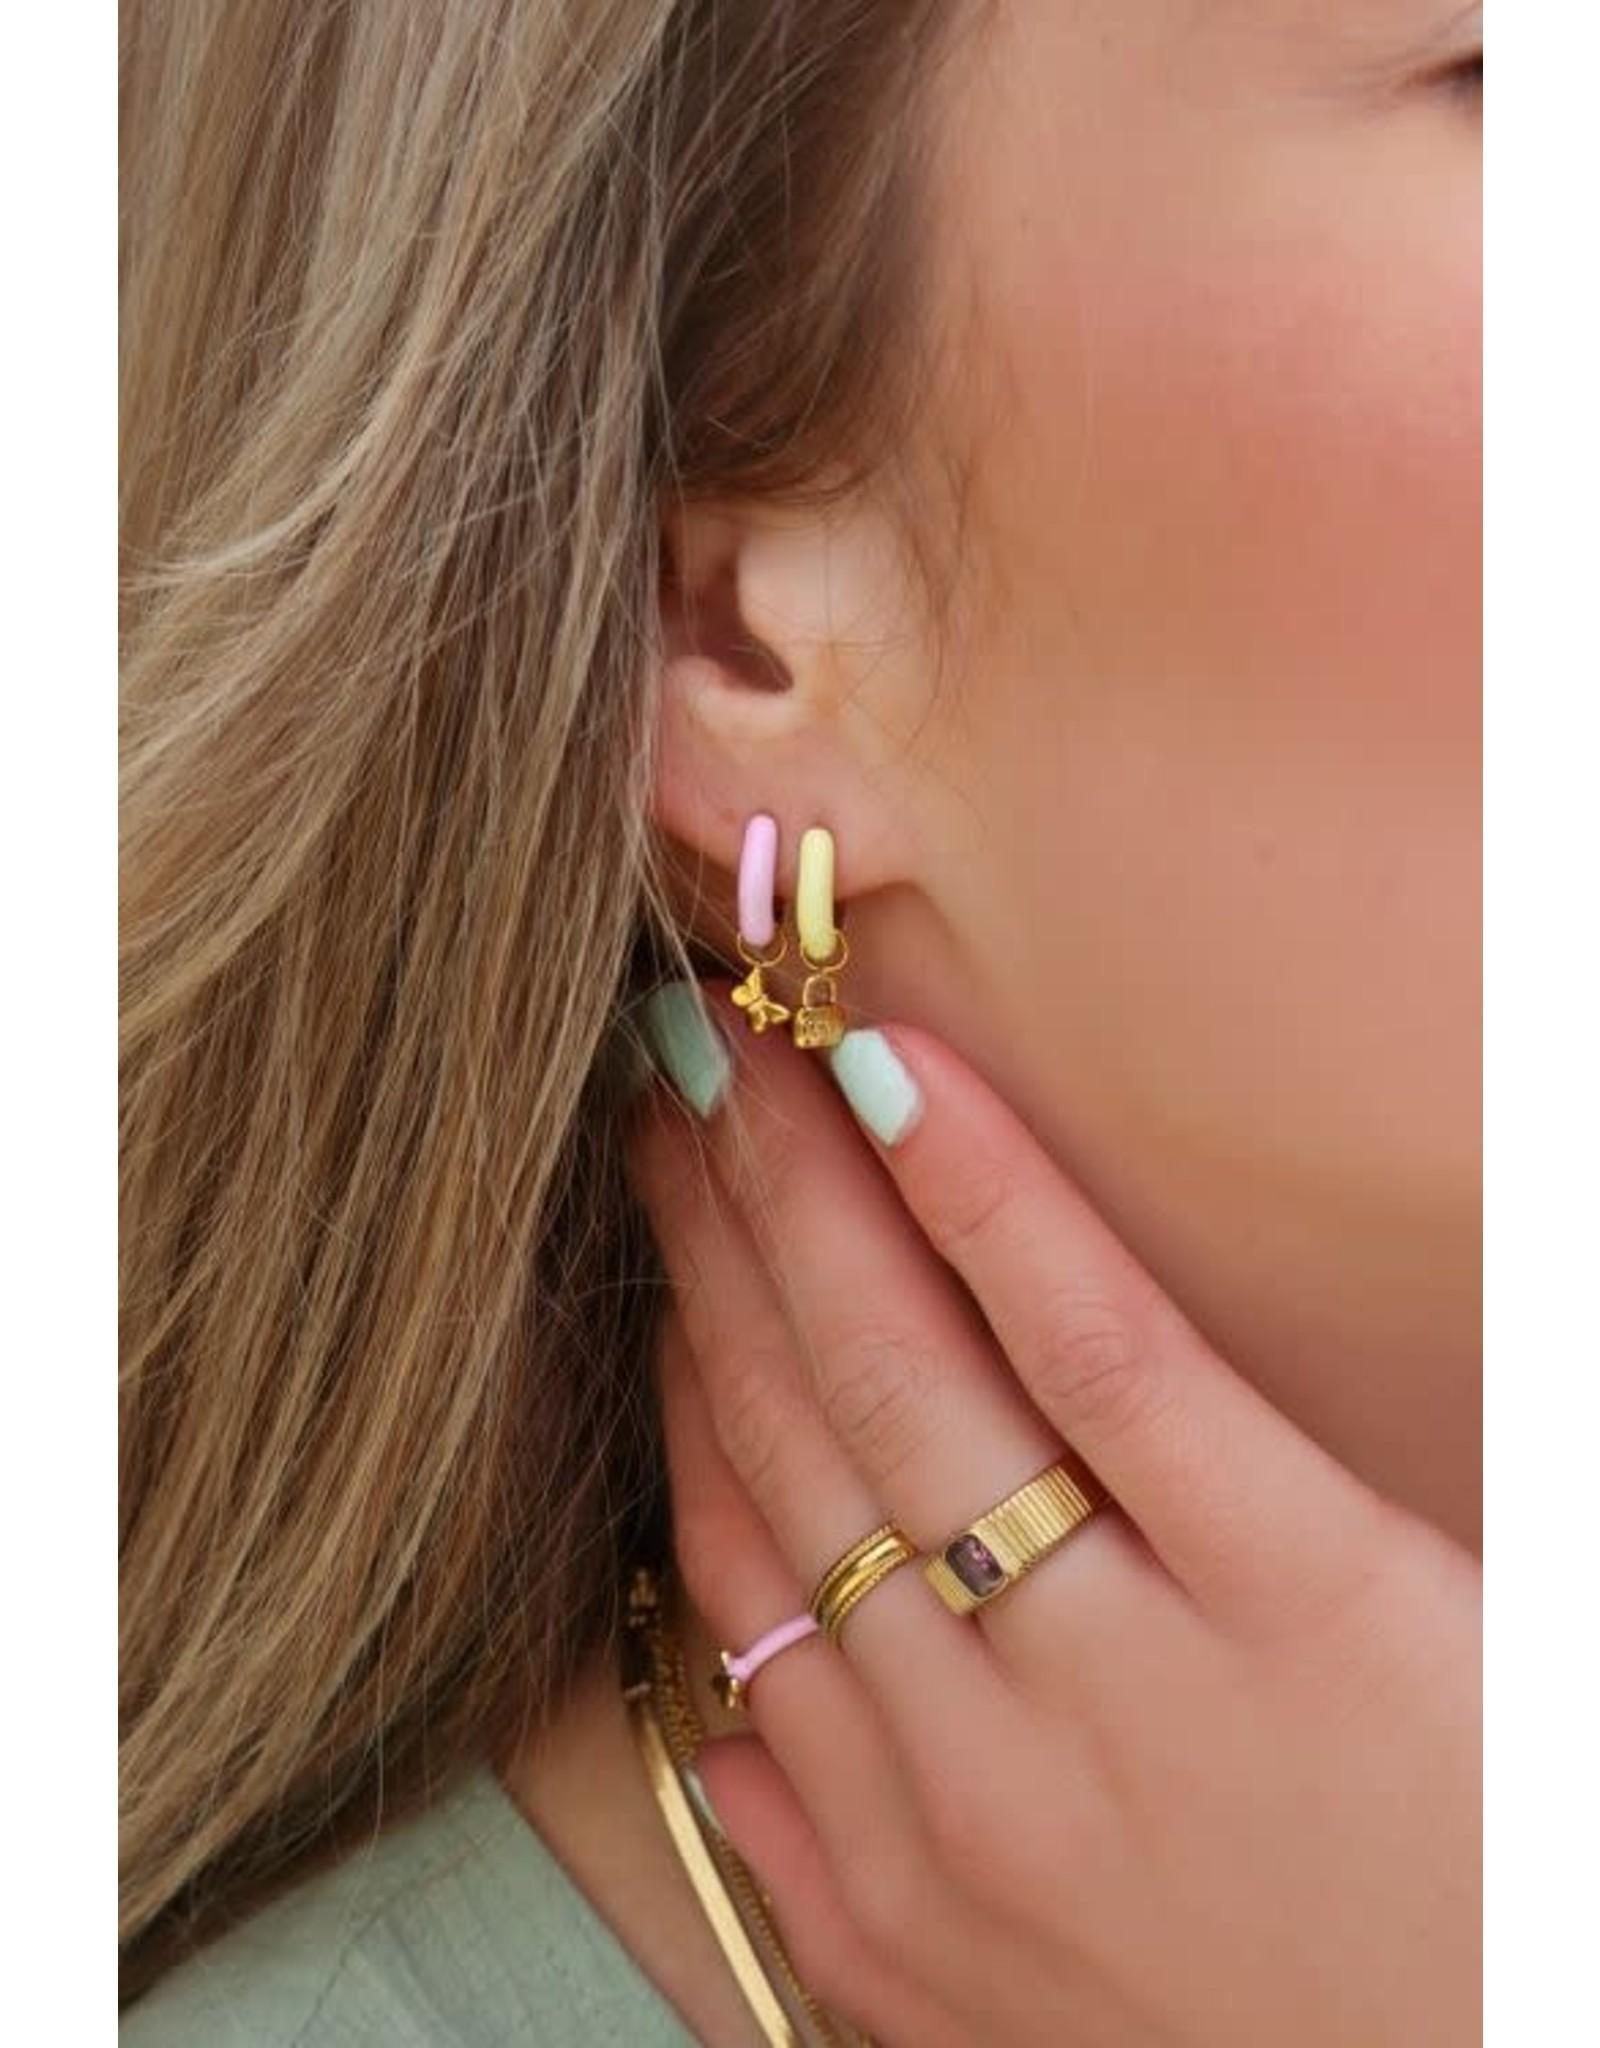 My Jewellery My Jewellery oorringen geel slot